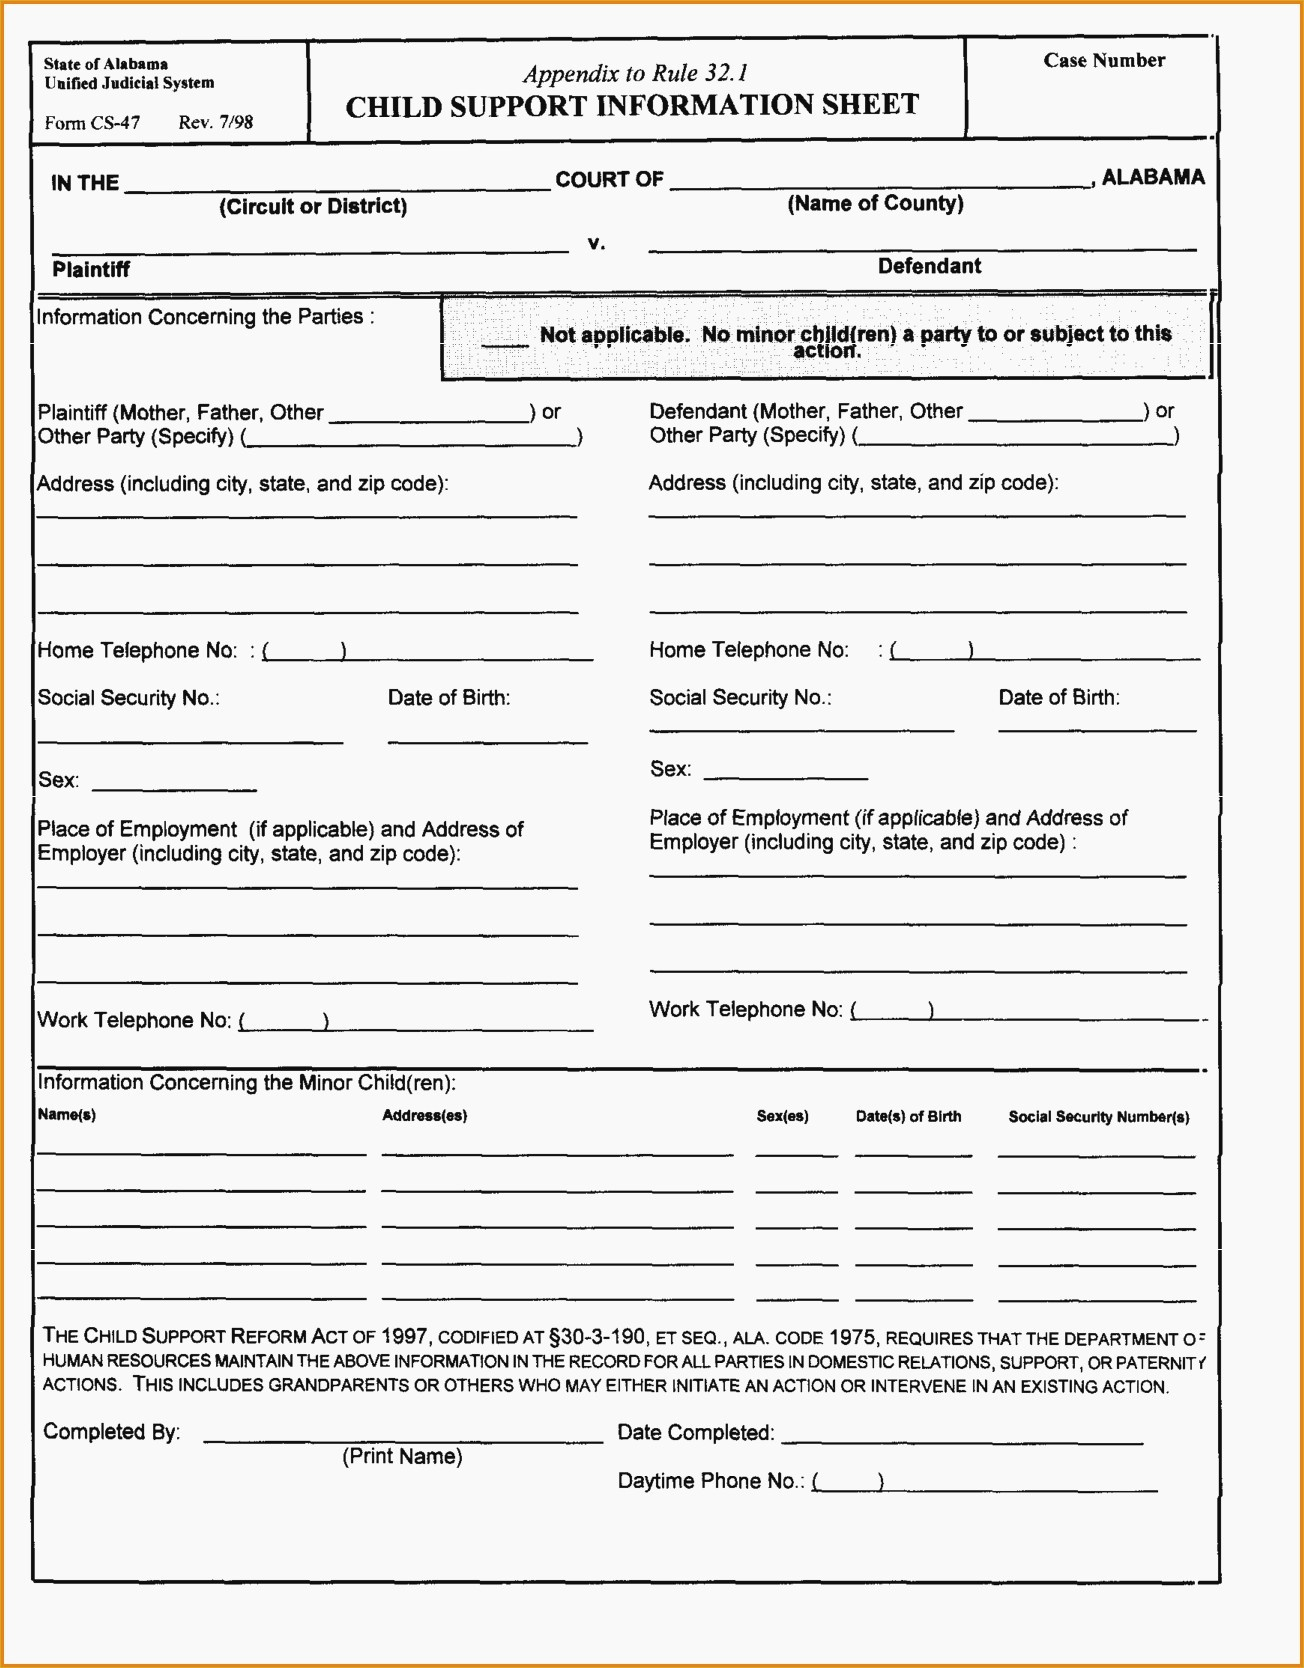 Fake Divorce Papers Luxury Free Printable Fake Pregnancy Papers - Free Printable Divorce Papers